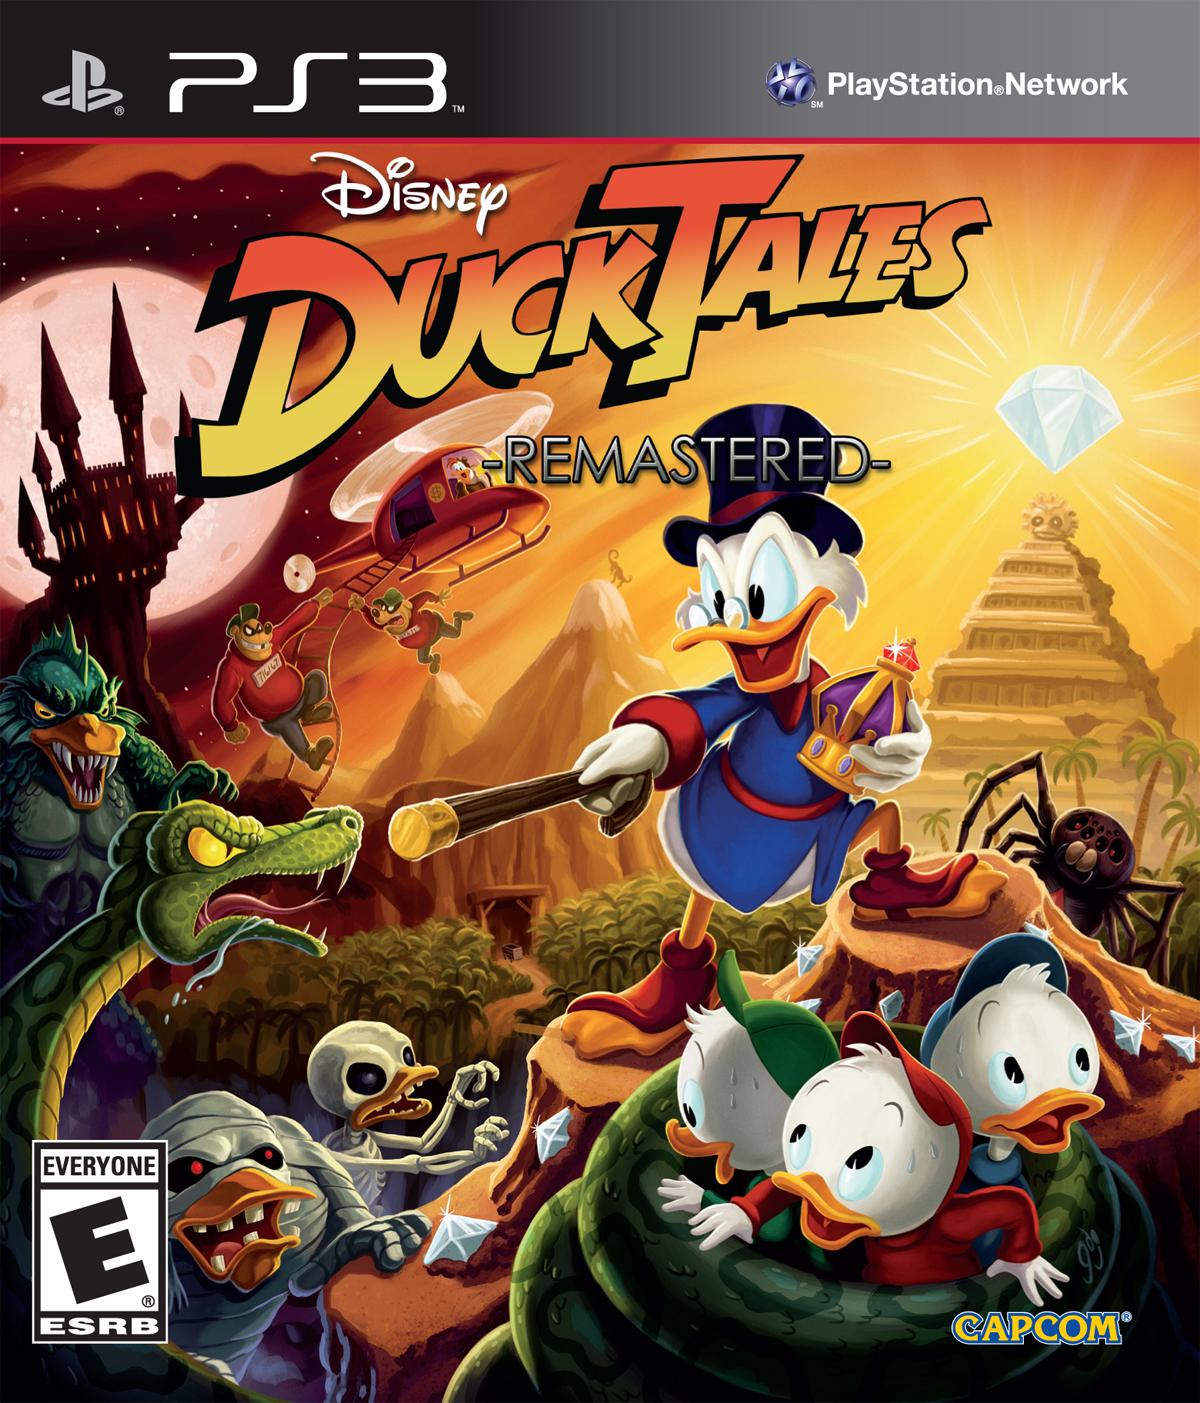 DuckTalesRemastered PS3 Jaquette 001